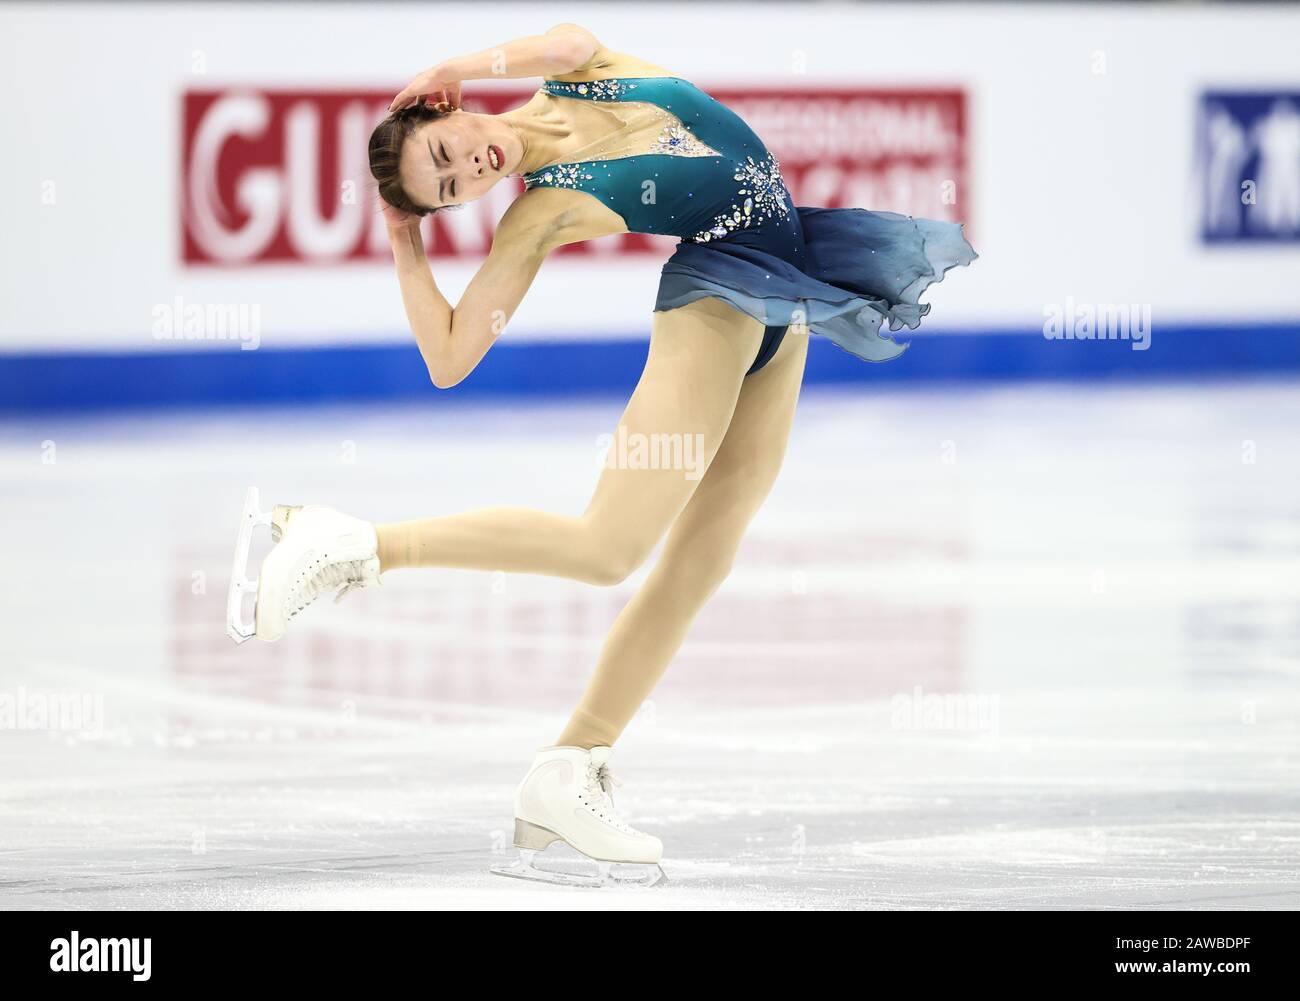 2020 Chinese Figure Skating Championships